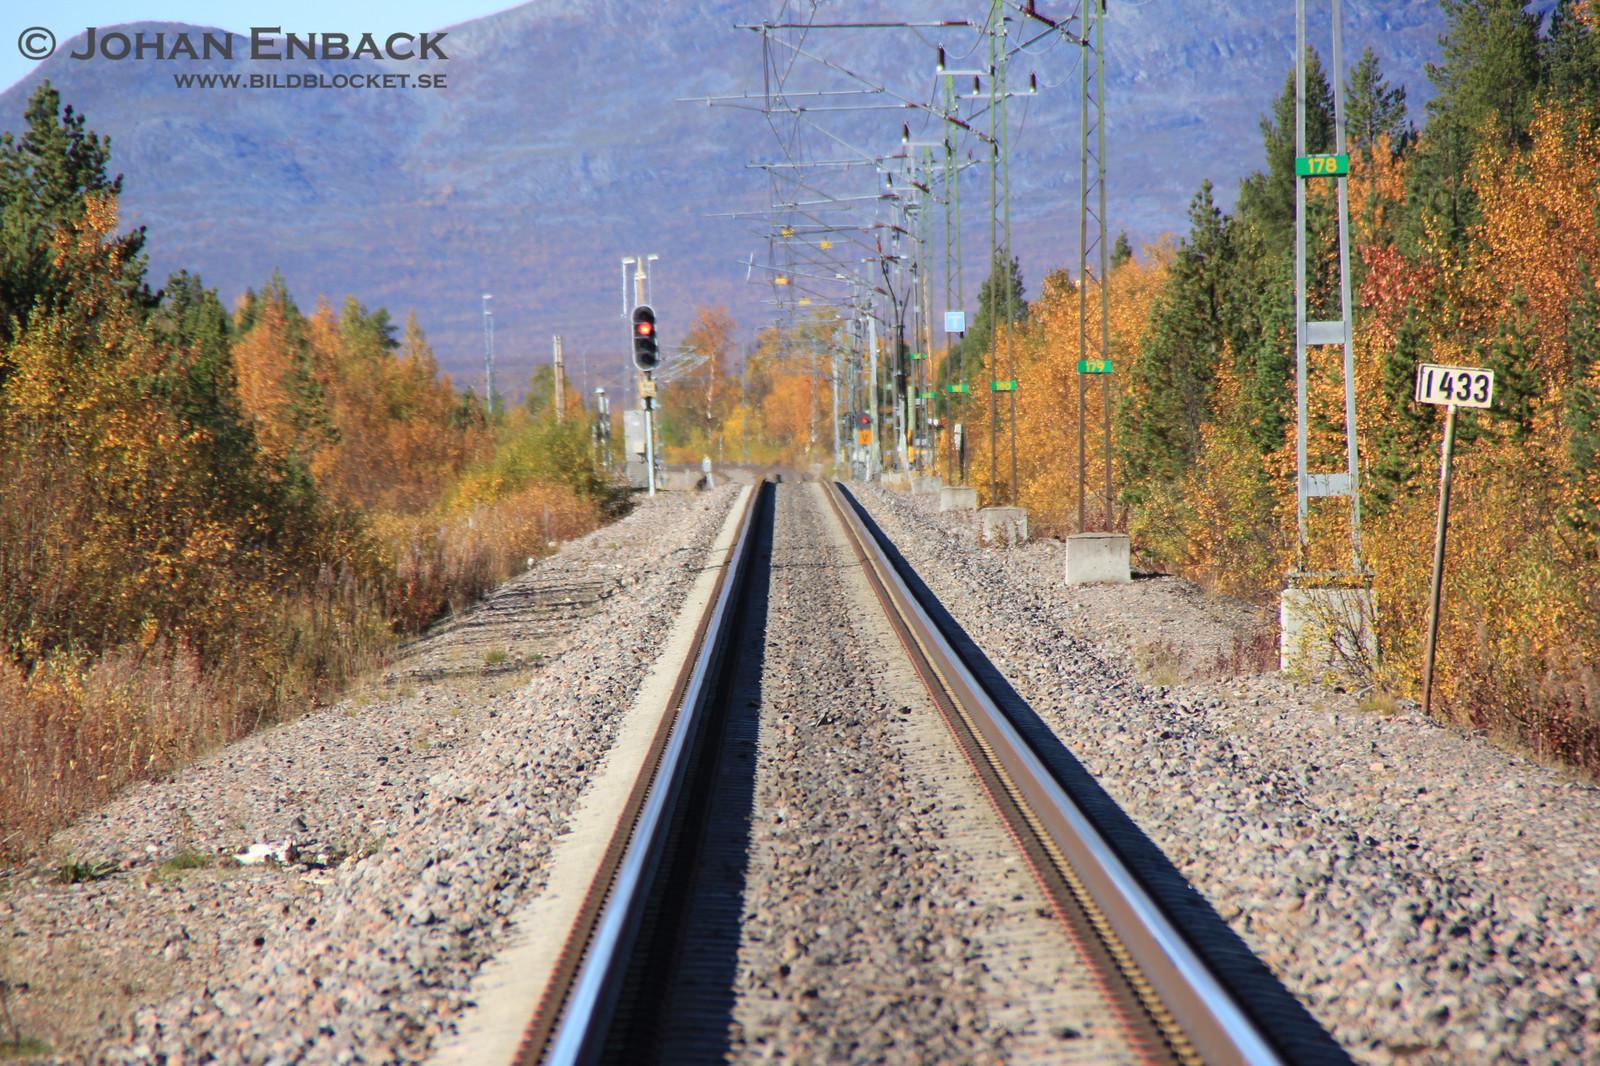 Bilder Lappland Kiruna Johan Enback Photography Bildblocket